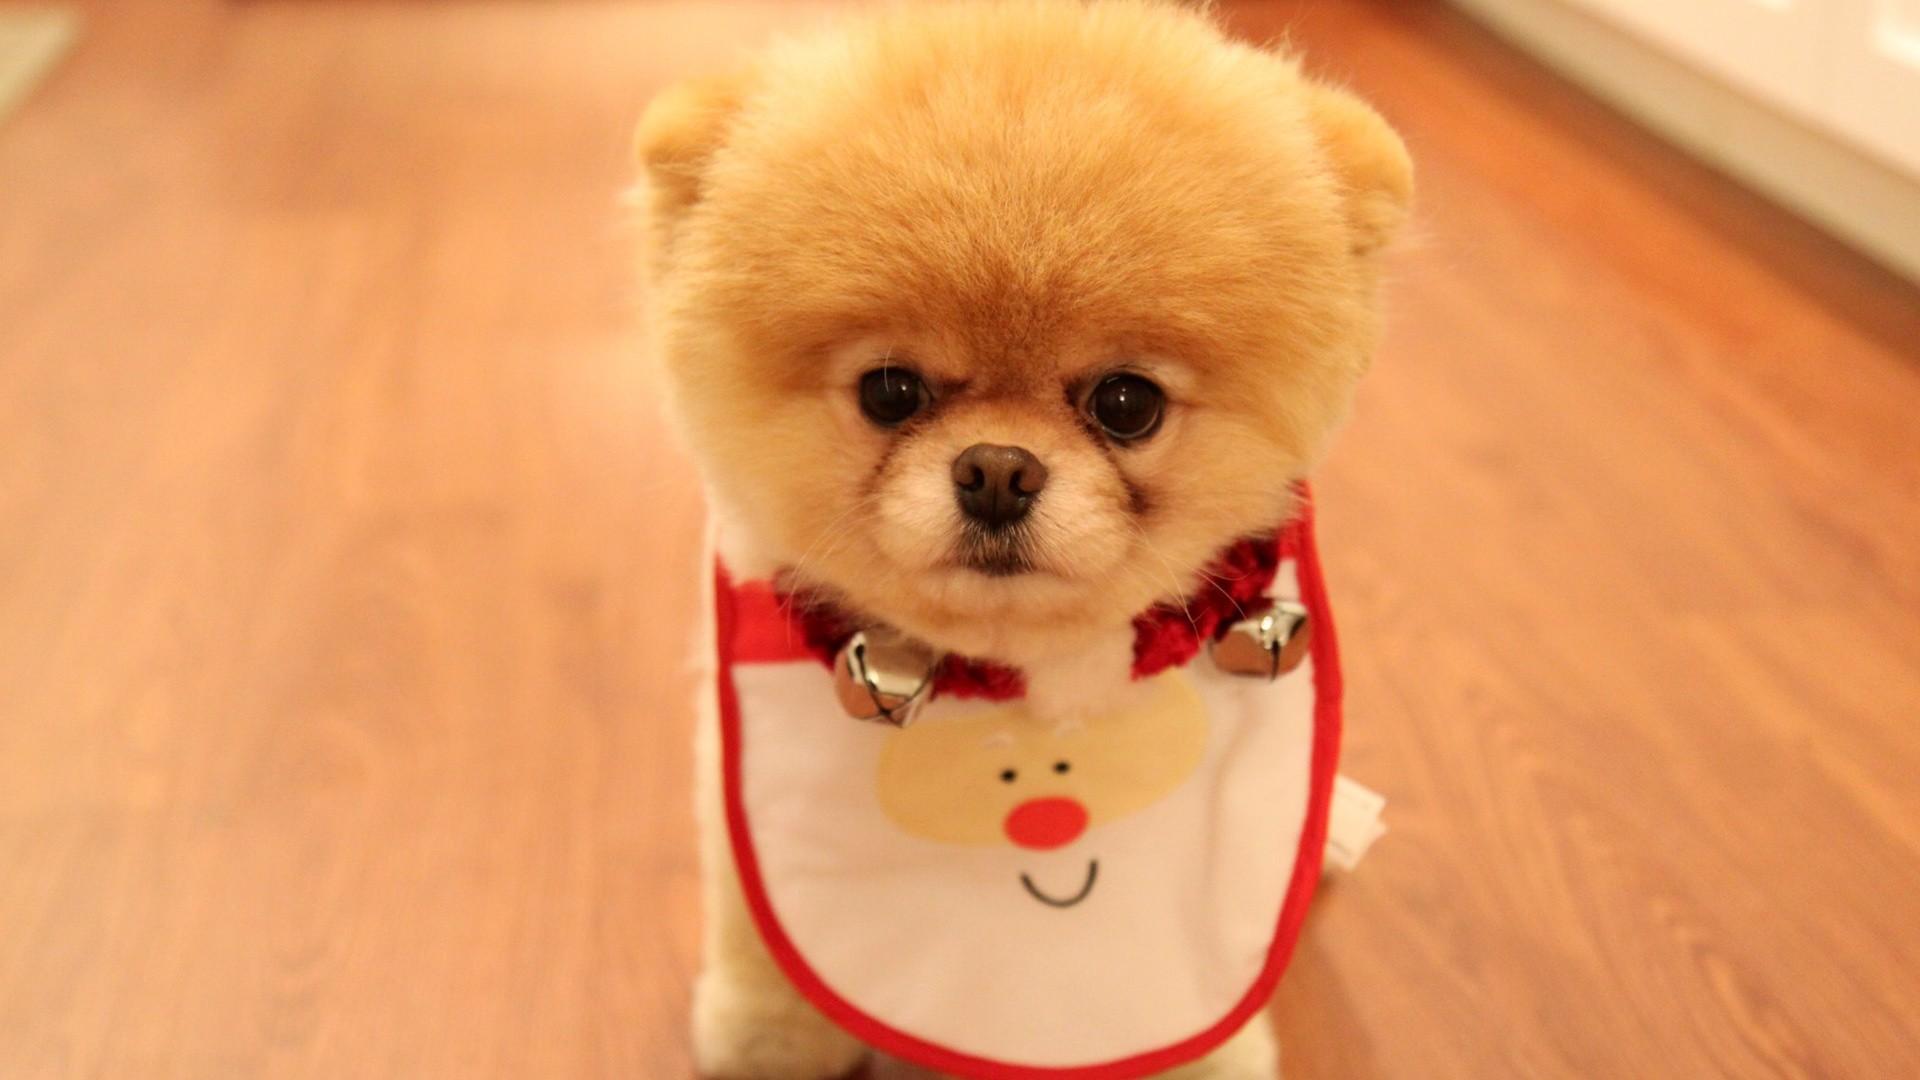 Download Wallpaper Halloween Puppy - 911186-christmas-puppies-wallpaper-1920x1080-for-tablet  Trends_1009633.jpg